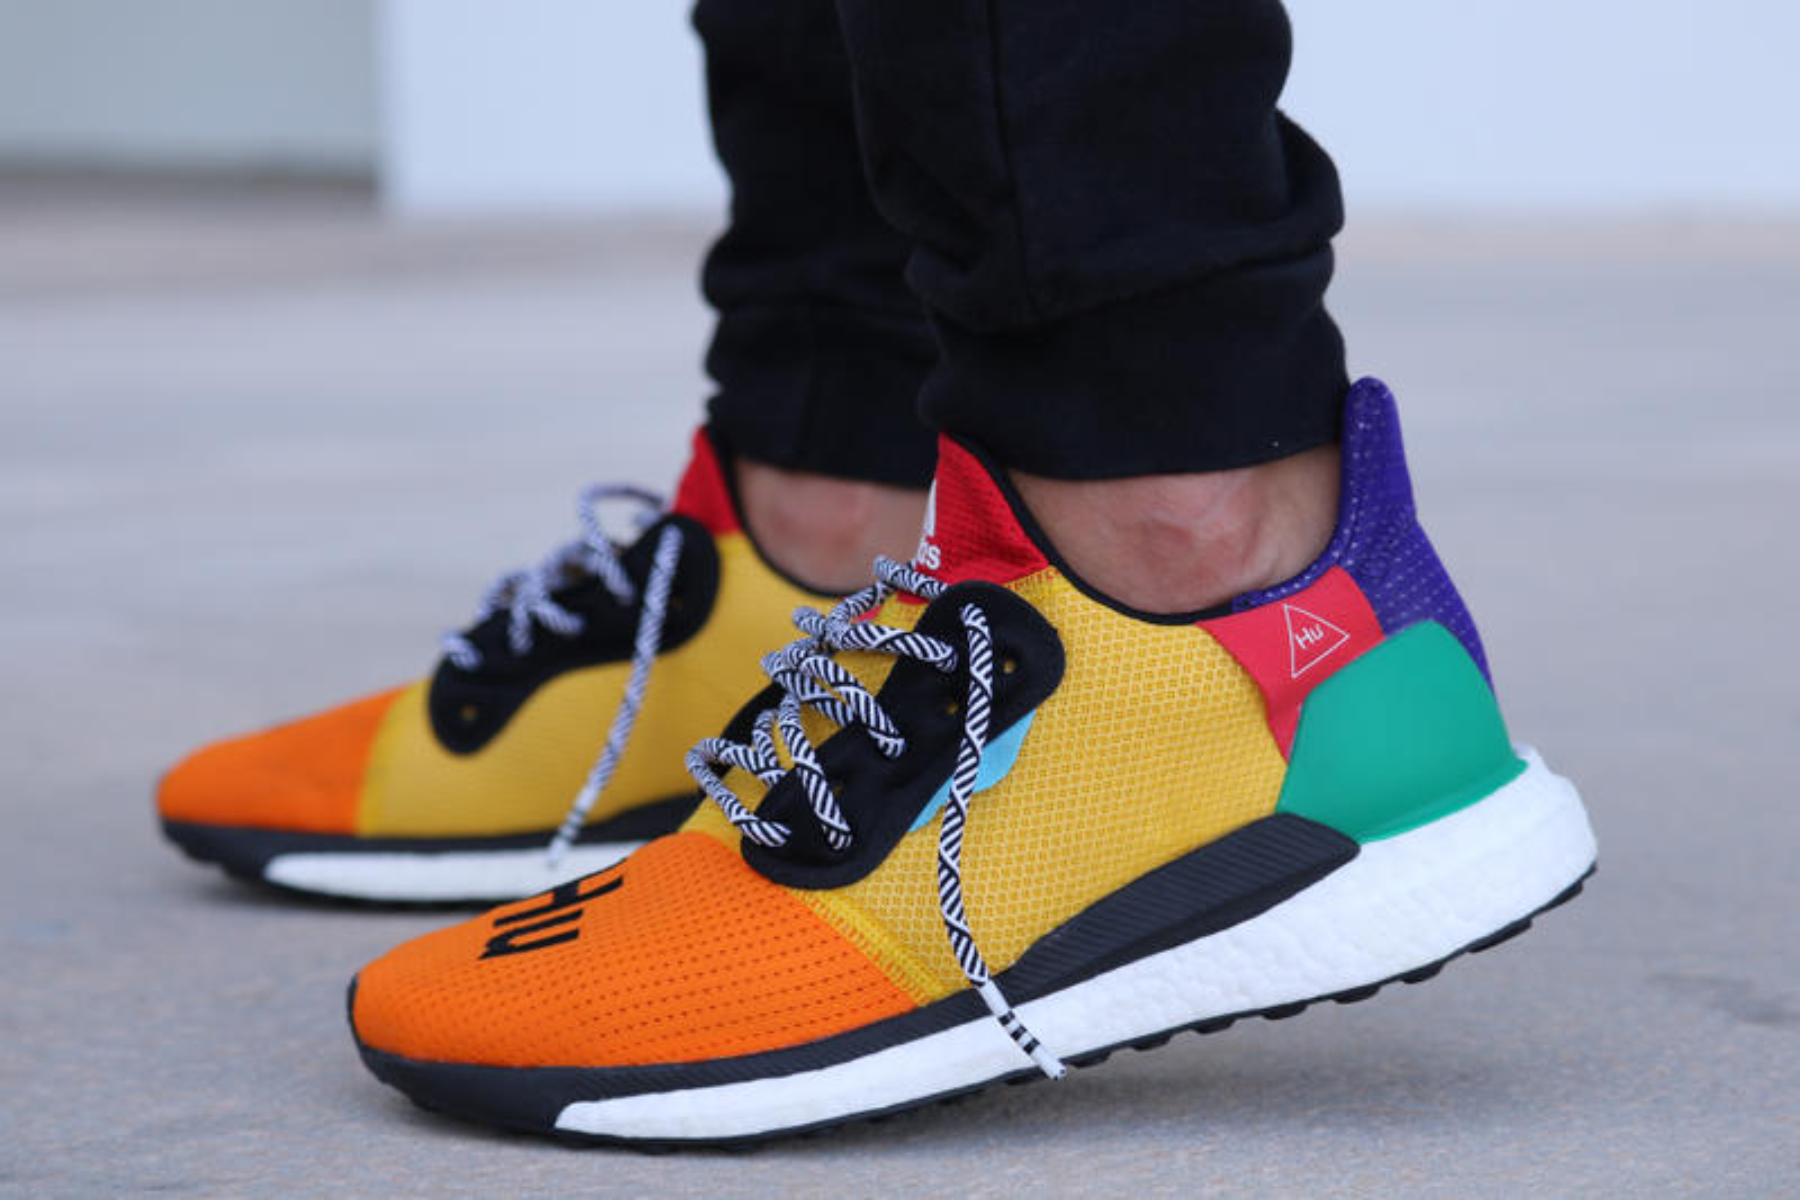 An On-Foot Look at the Pharrell x adidas Solar Hu Glide St